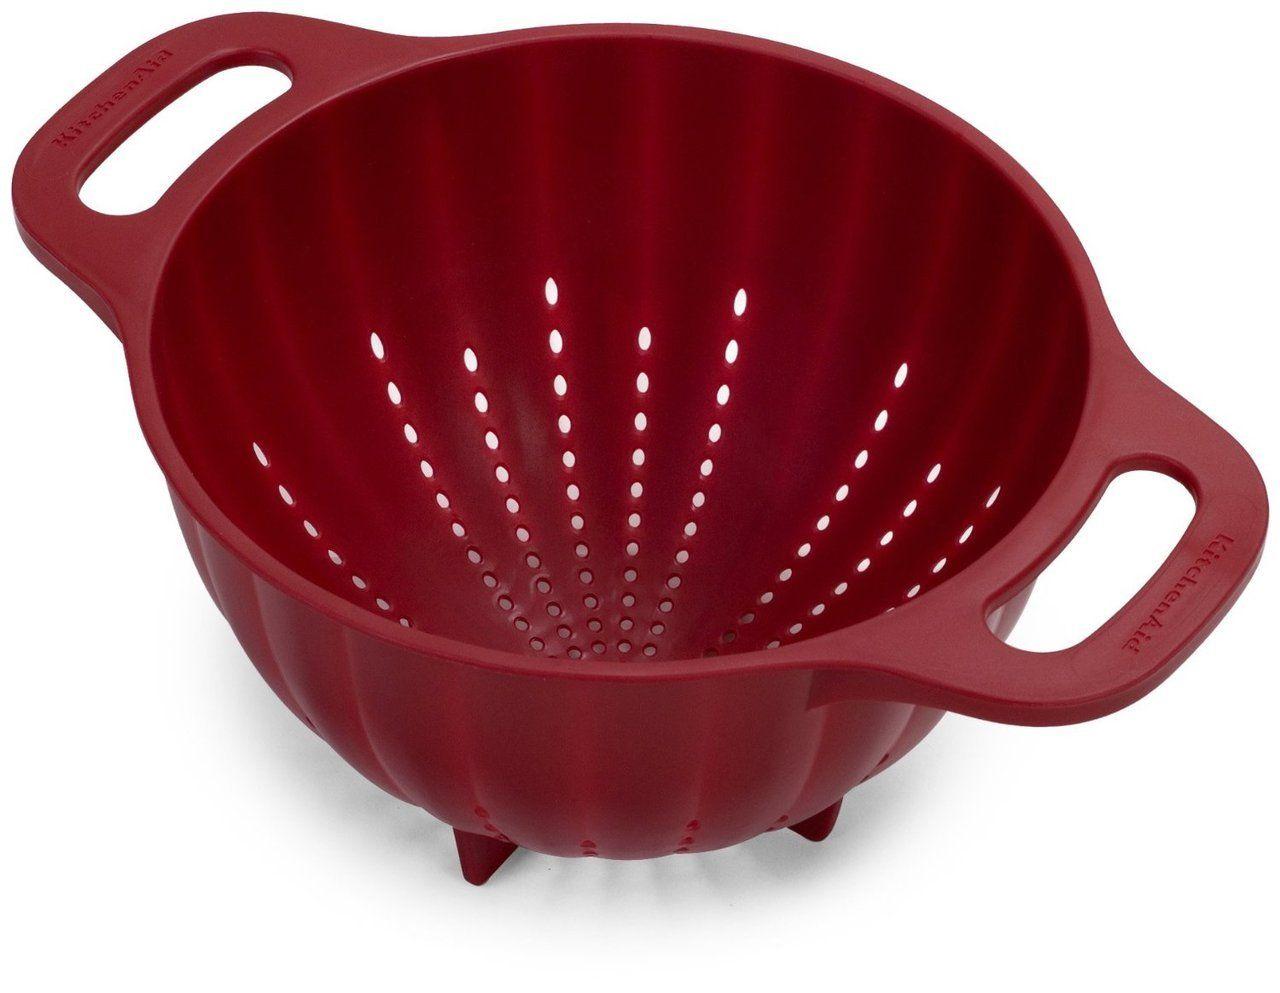 Kitchenaid classic 5quart colander red 1095 total cost